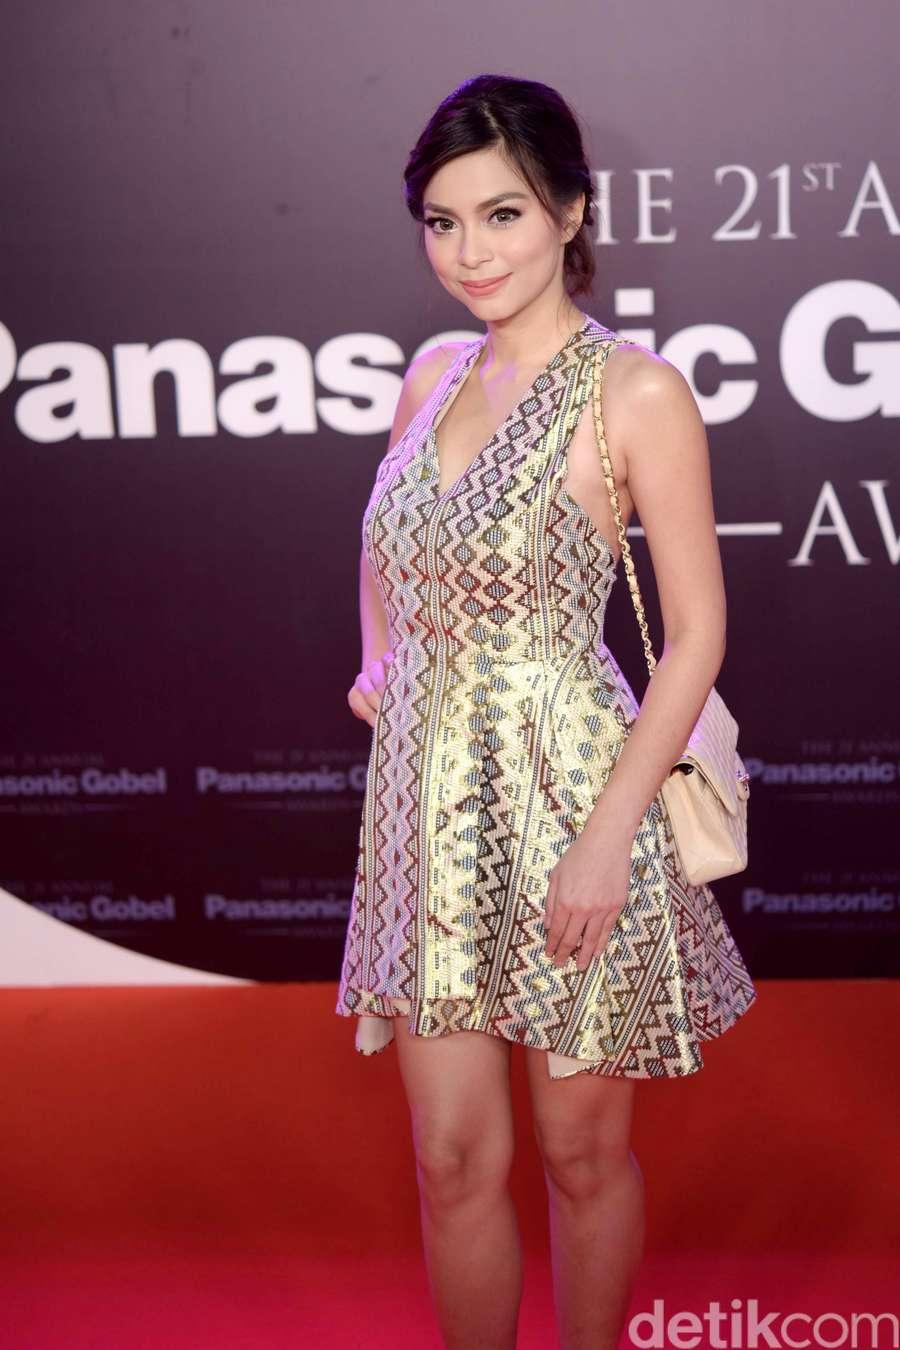 Foto Jadul Tamara Bleszynski hingga Penampilan Dewi Sandra